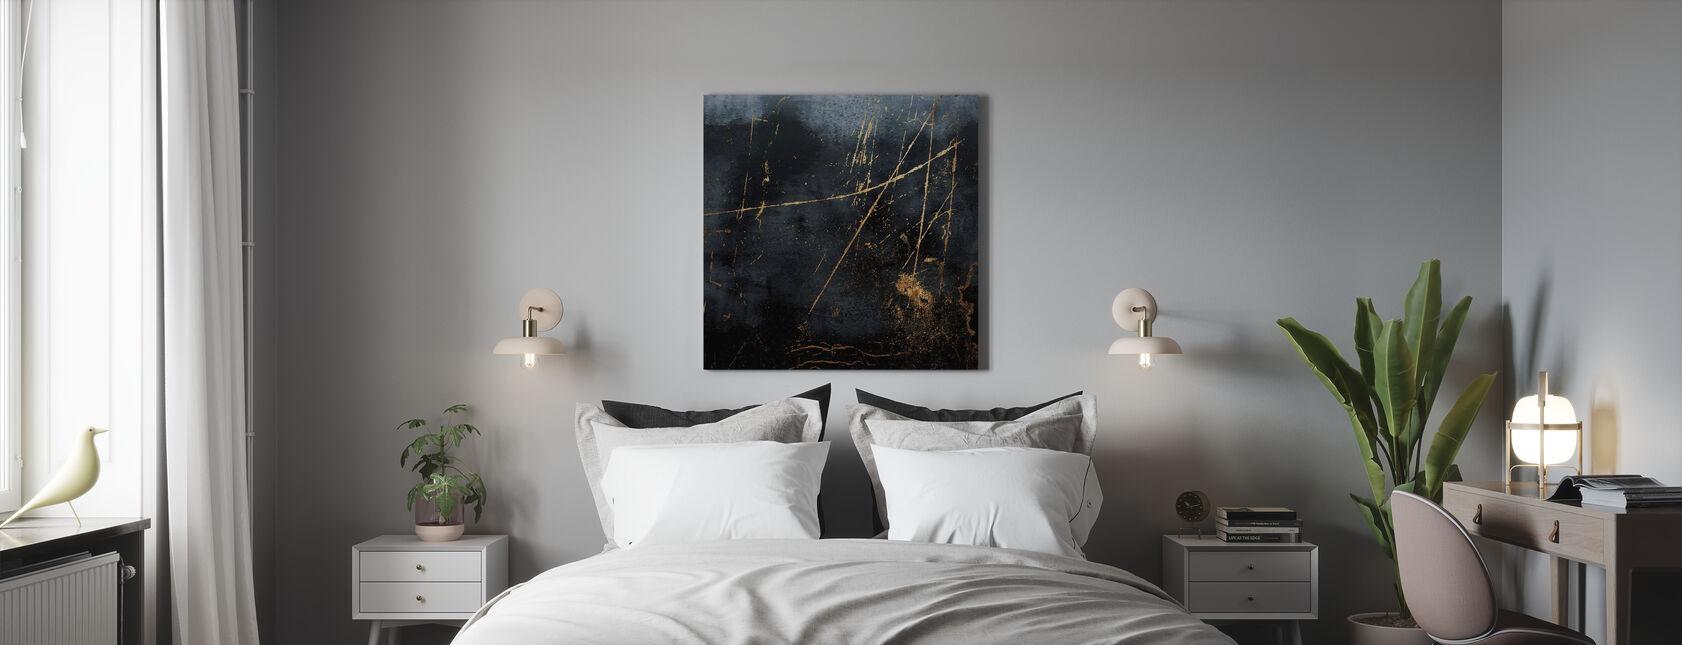 Saffier - Canvas print - Slaapkamer